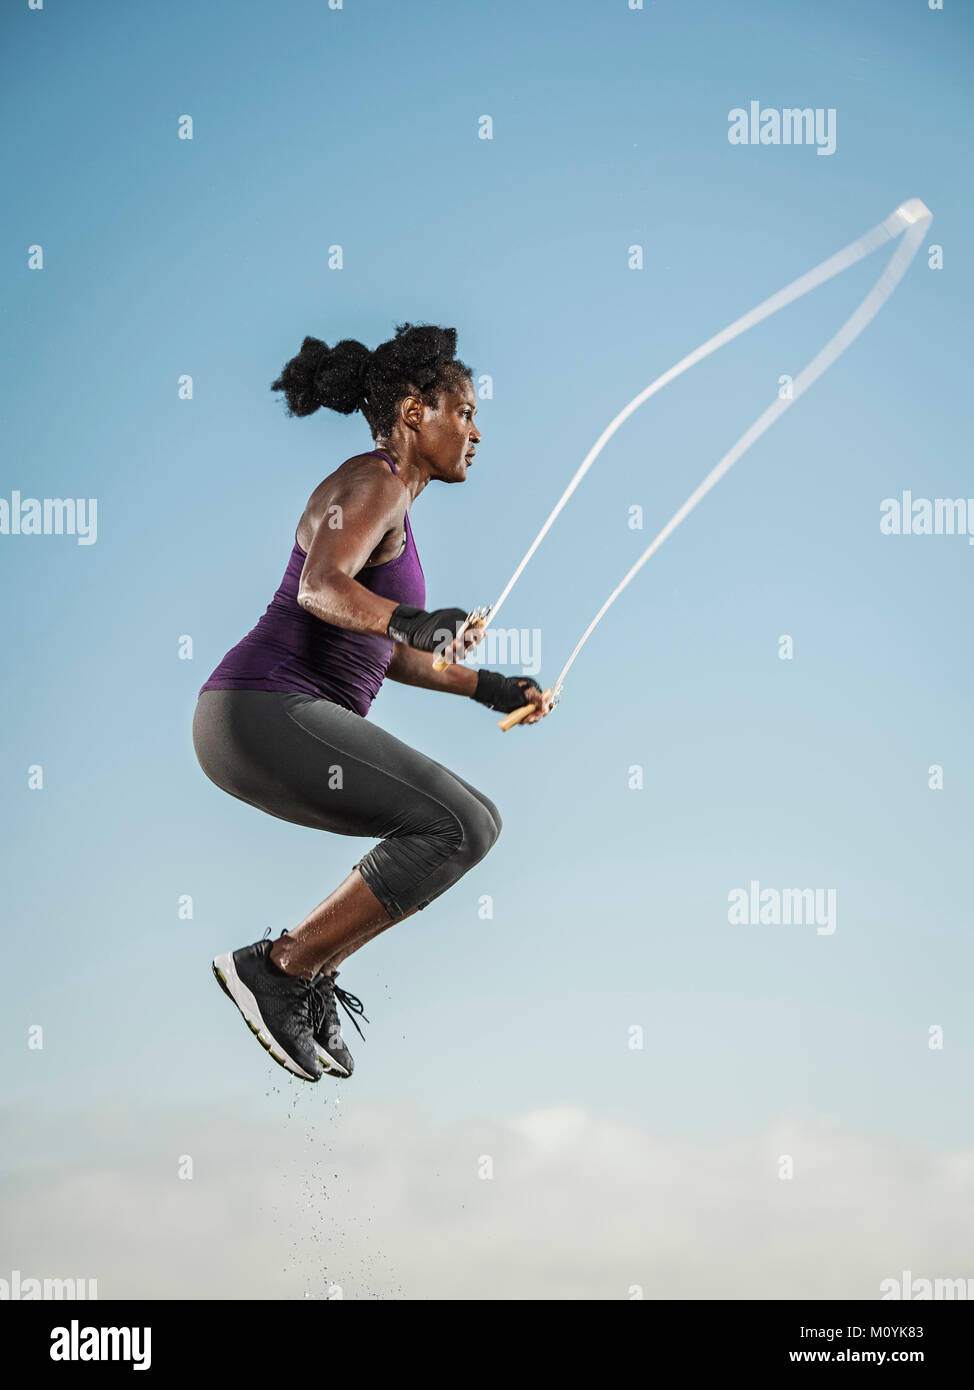 Schwarze Frau Seilspringen im Himmel Stockfoto